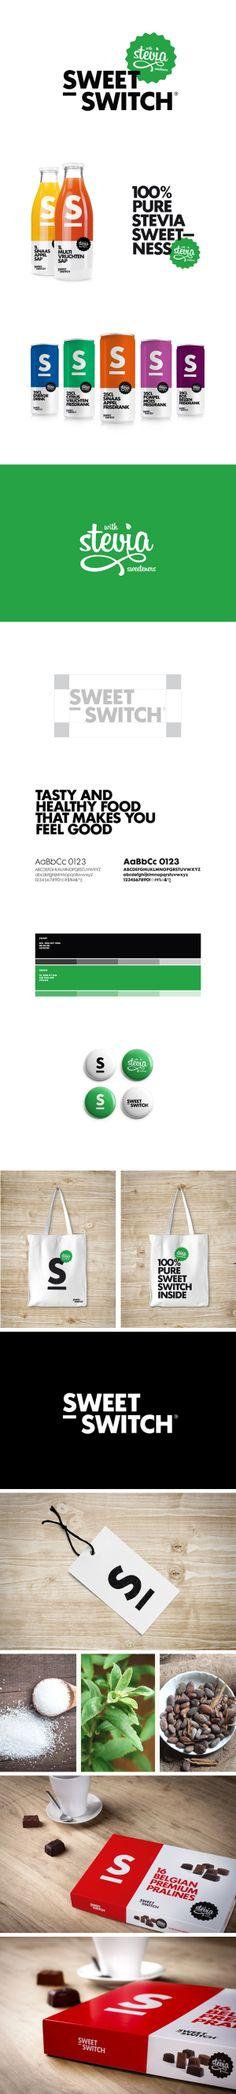 Sweet Switch by skinn , via Behance Interesting stevia #identity #packaging #branding PD